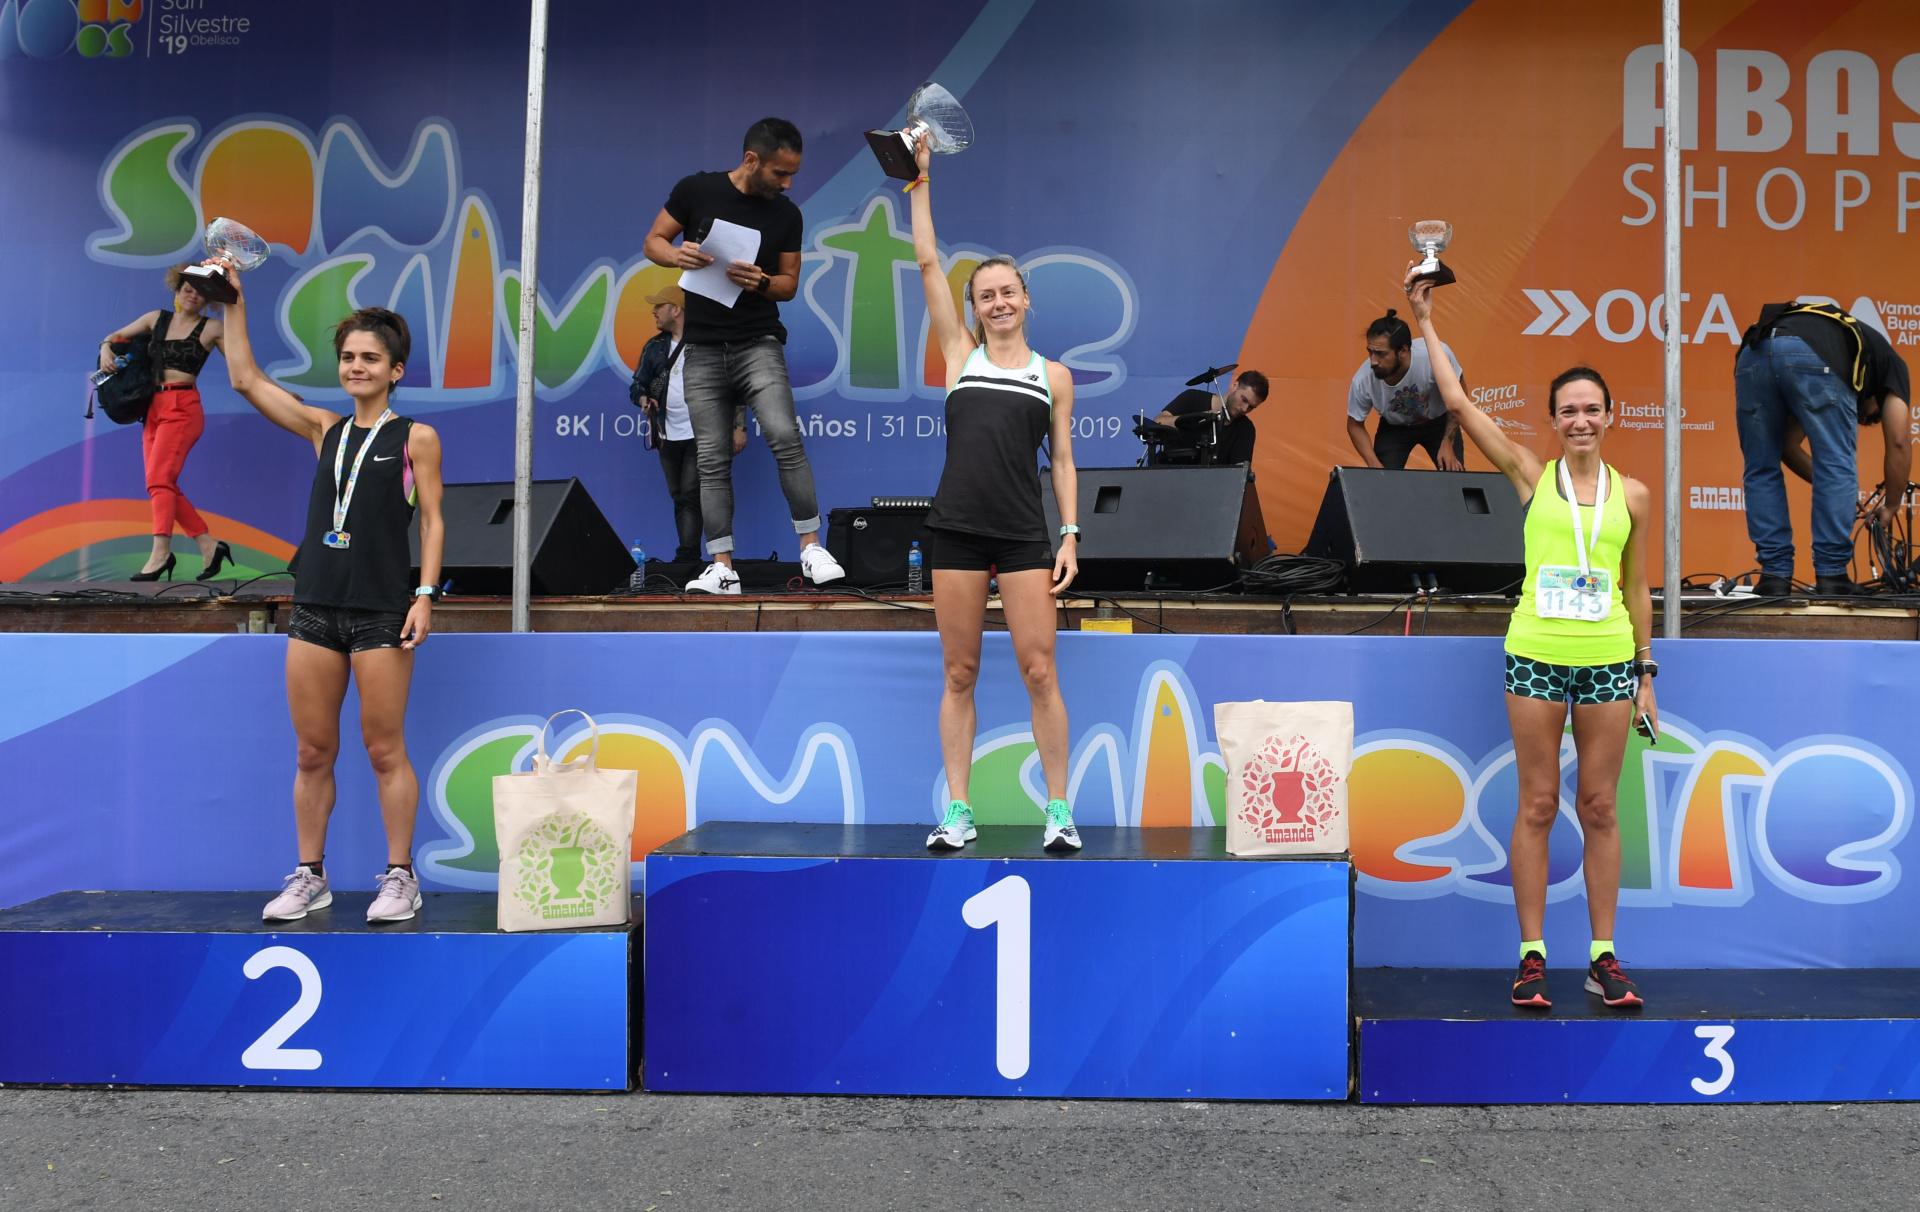 Chiara Mainetti (primera), Laura Vedia (segunda), Emilia Picciola (tercera) en el podio (Maximiliano Luna)